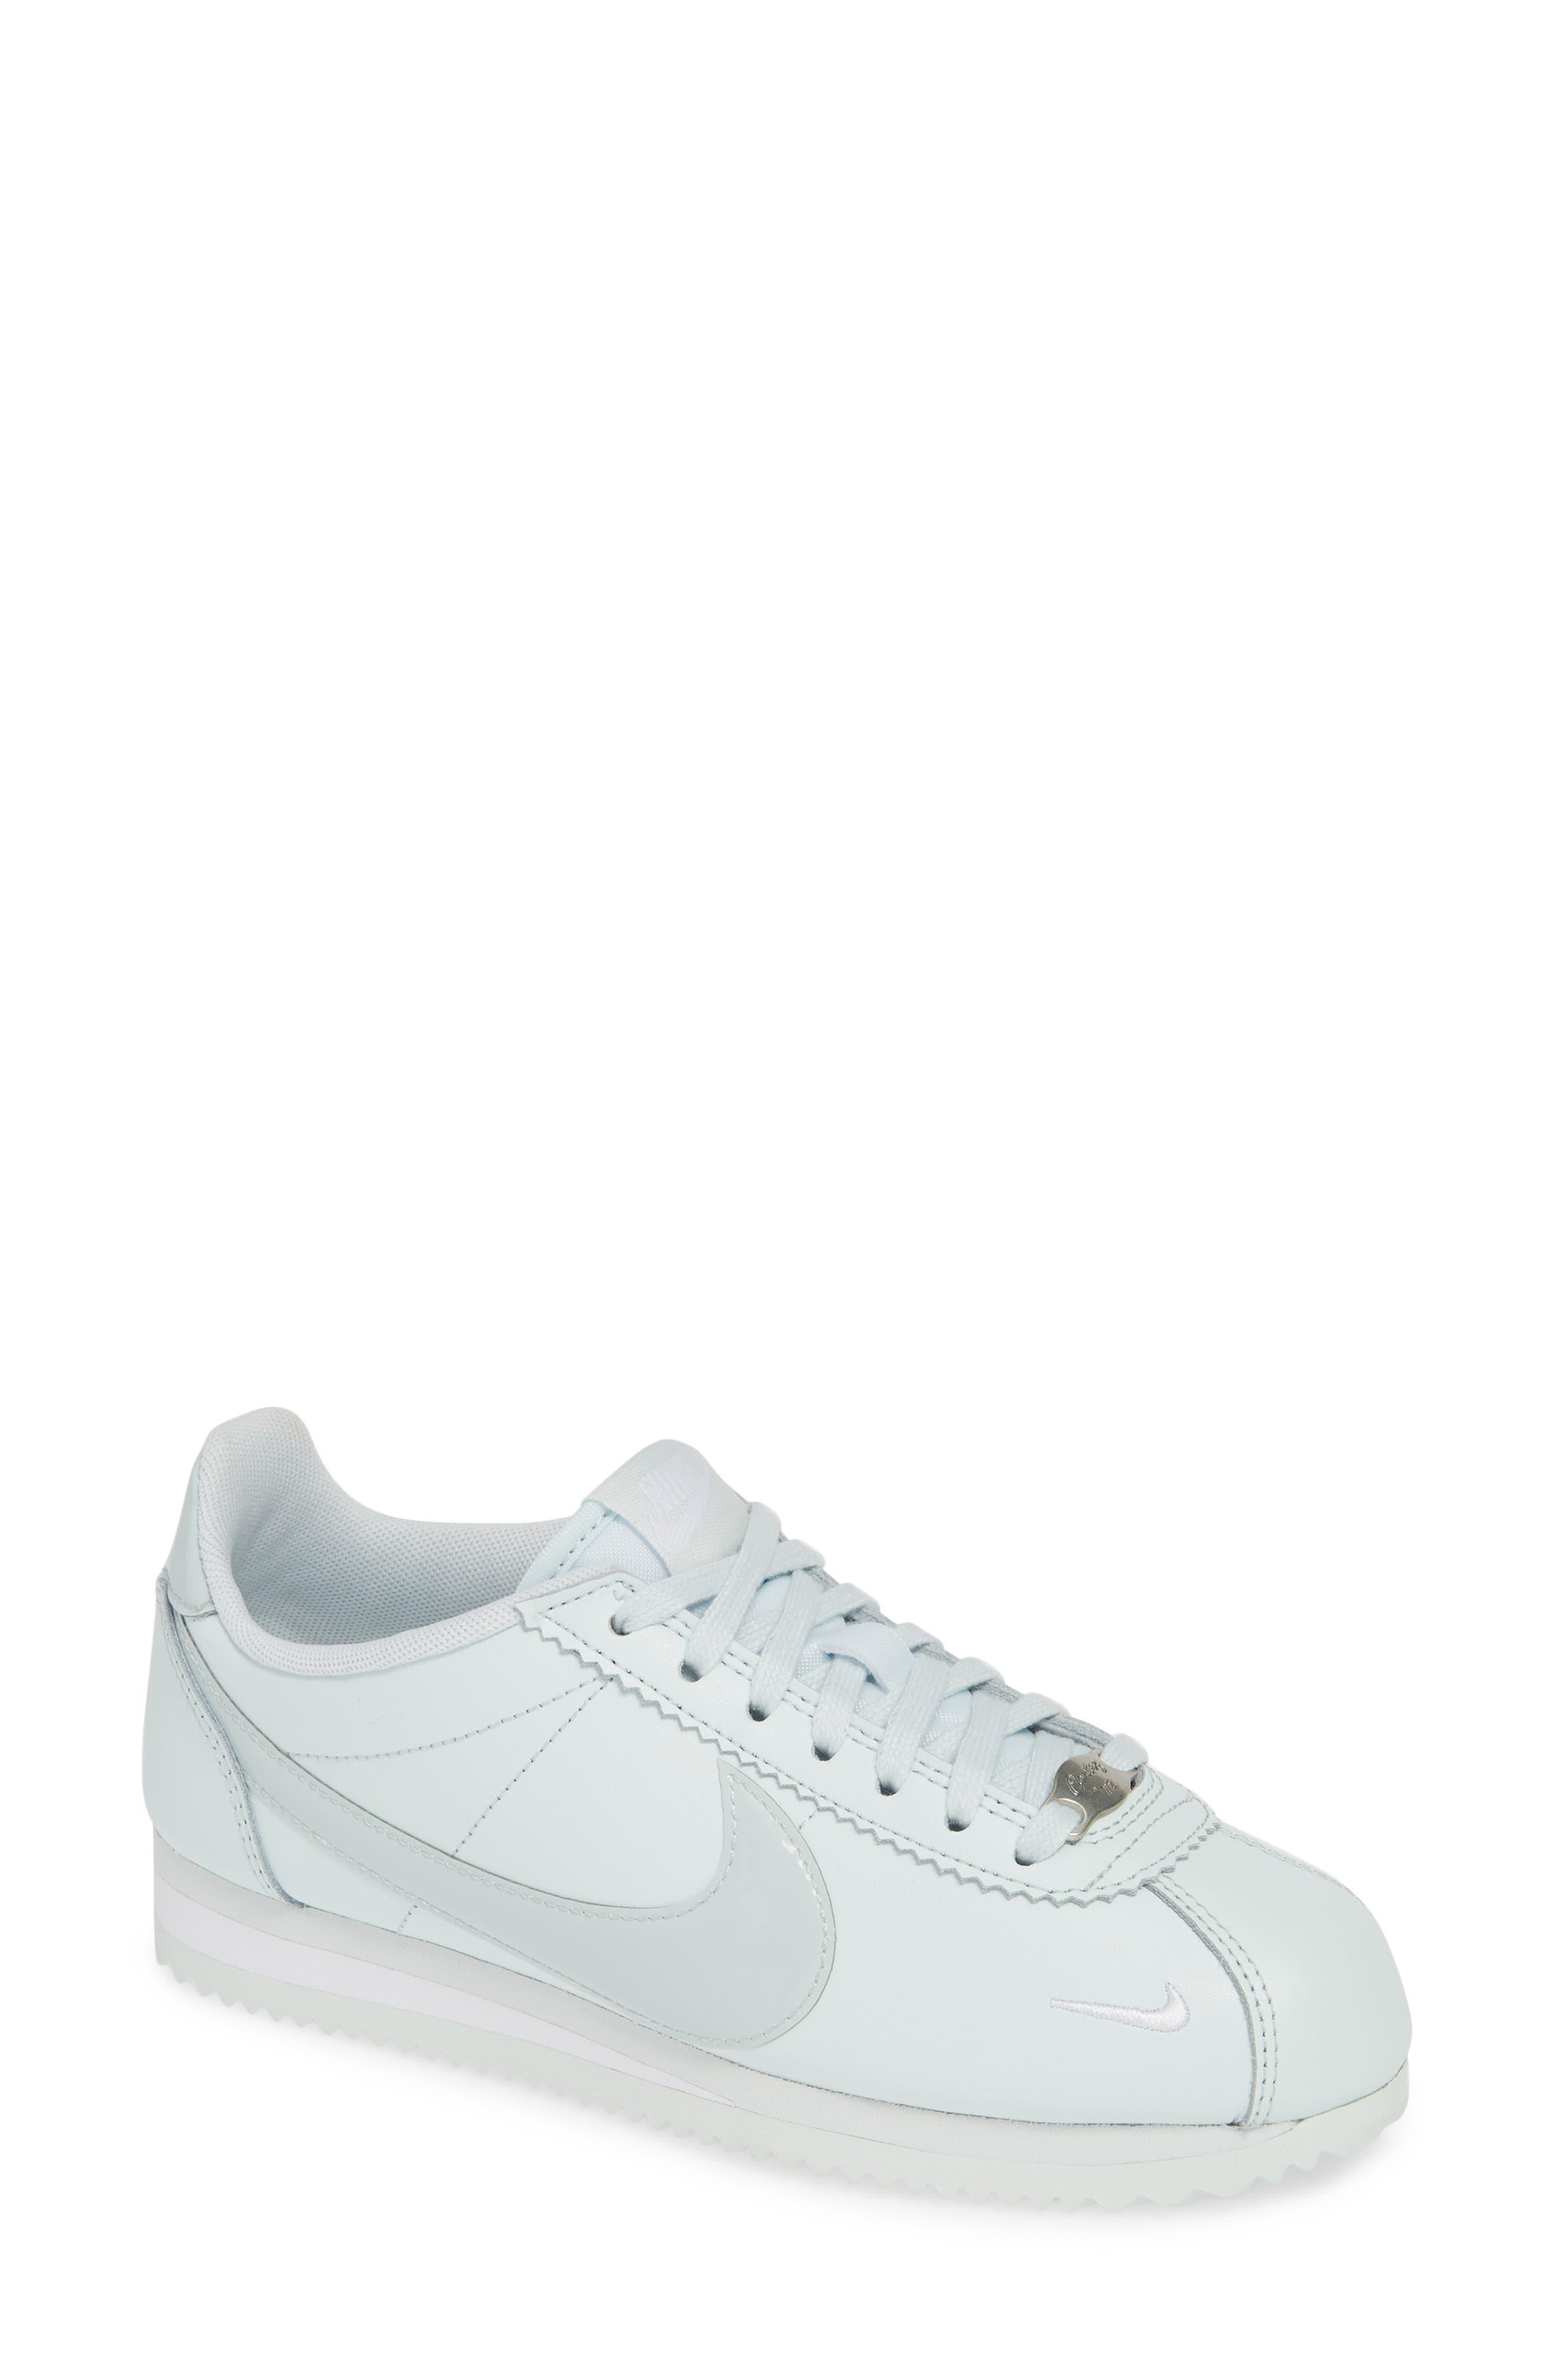 NIKE Classic Cortez Premium XLV Sneaker, Main, color, BARELY GREY/ WHITE